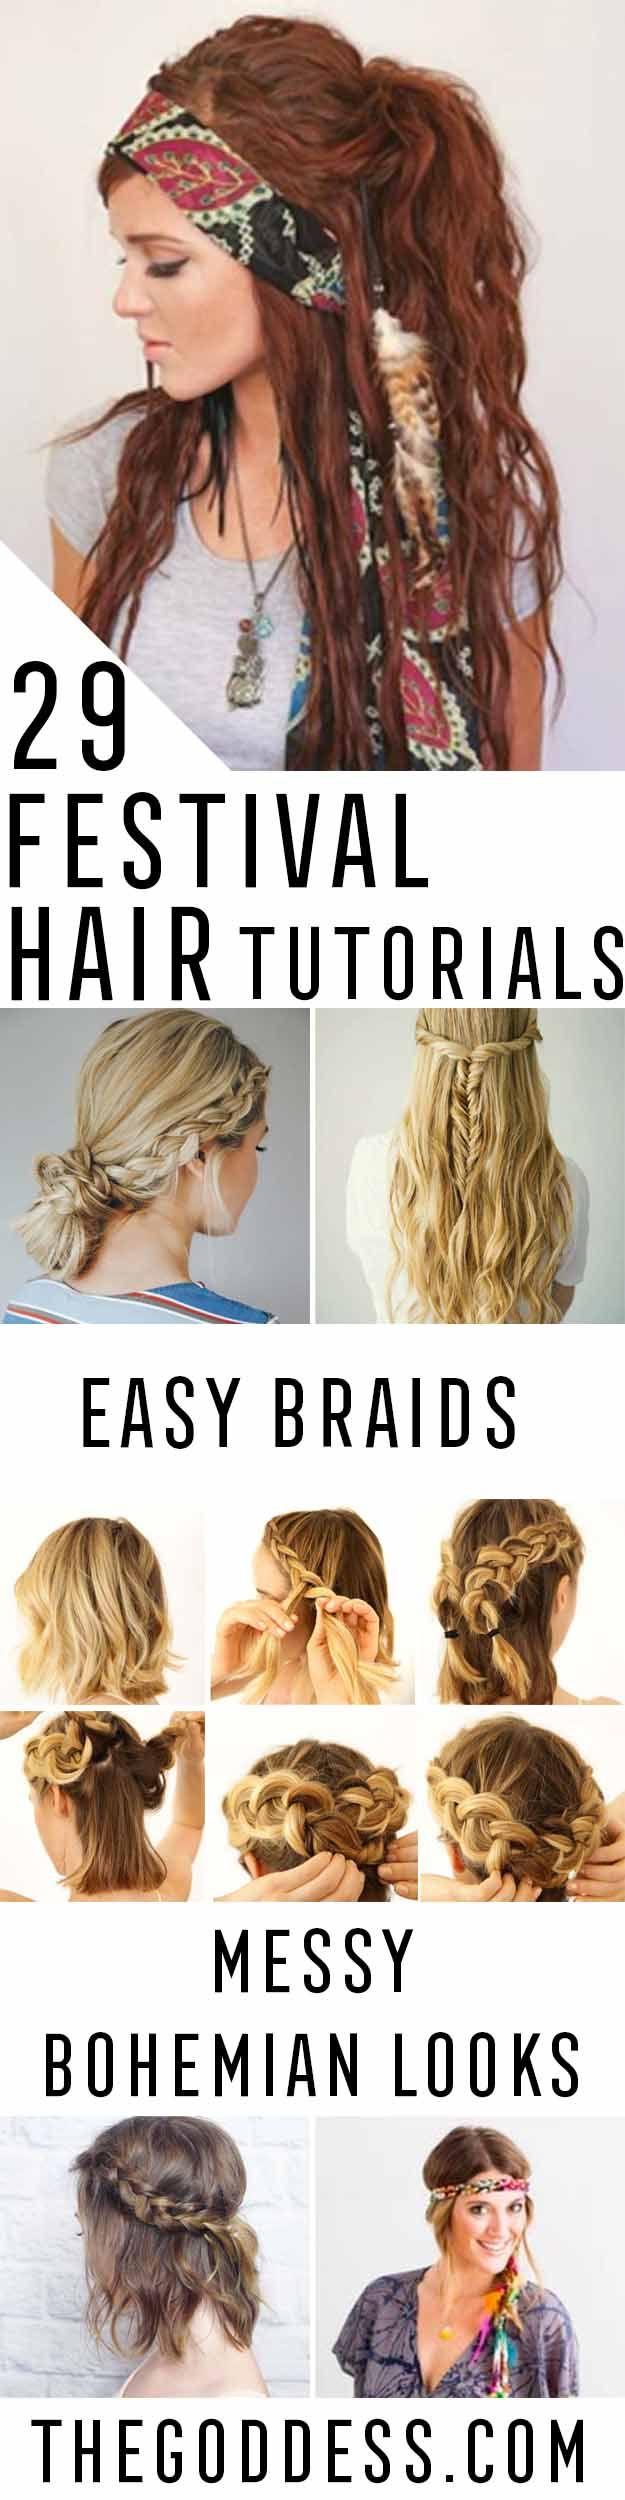 Best 25+ Curly hair tutorial ideas on Pinterest | Hair tutorial ...